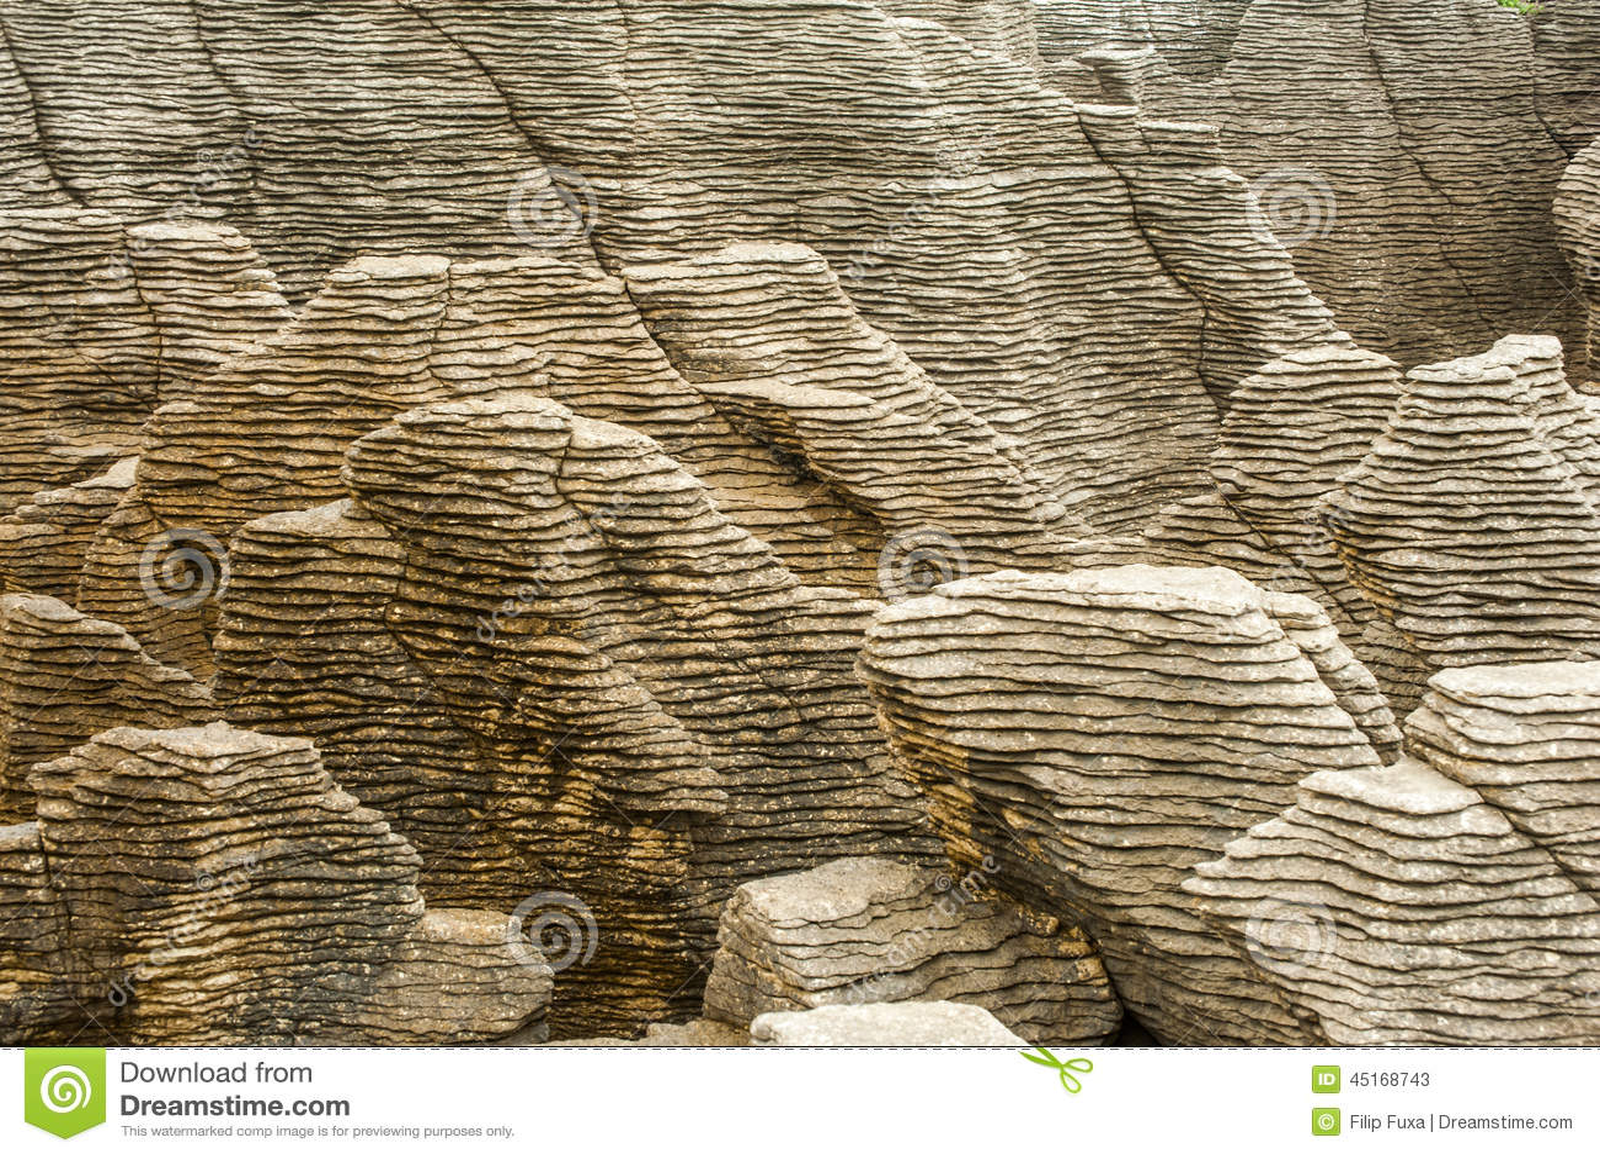 Newzealand Detail: Pancake Rock Stock Photo